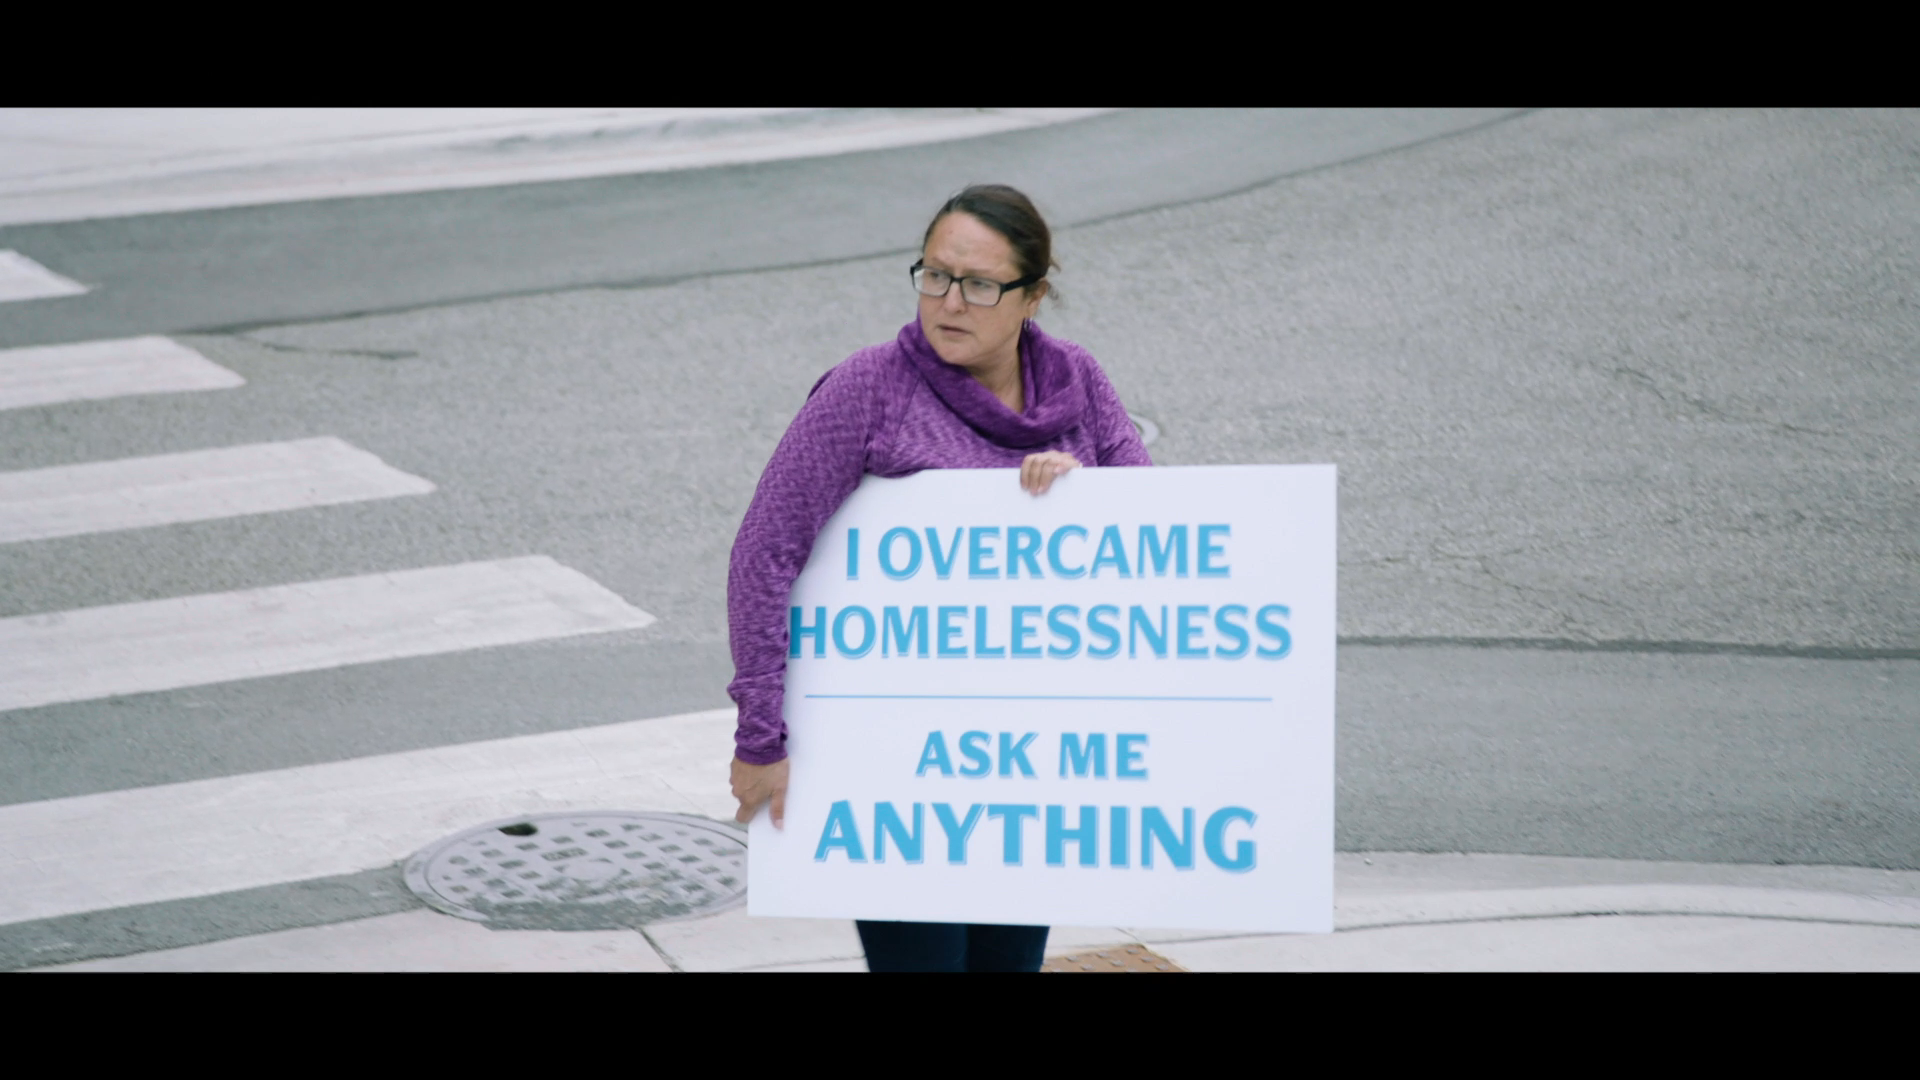 I Overcame Homelessness